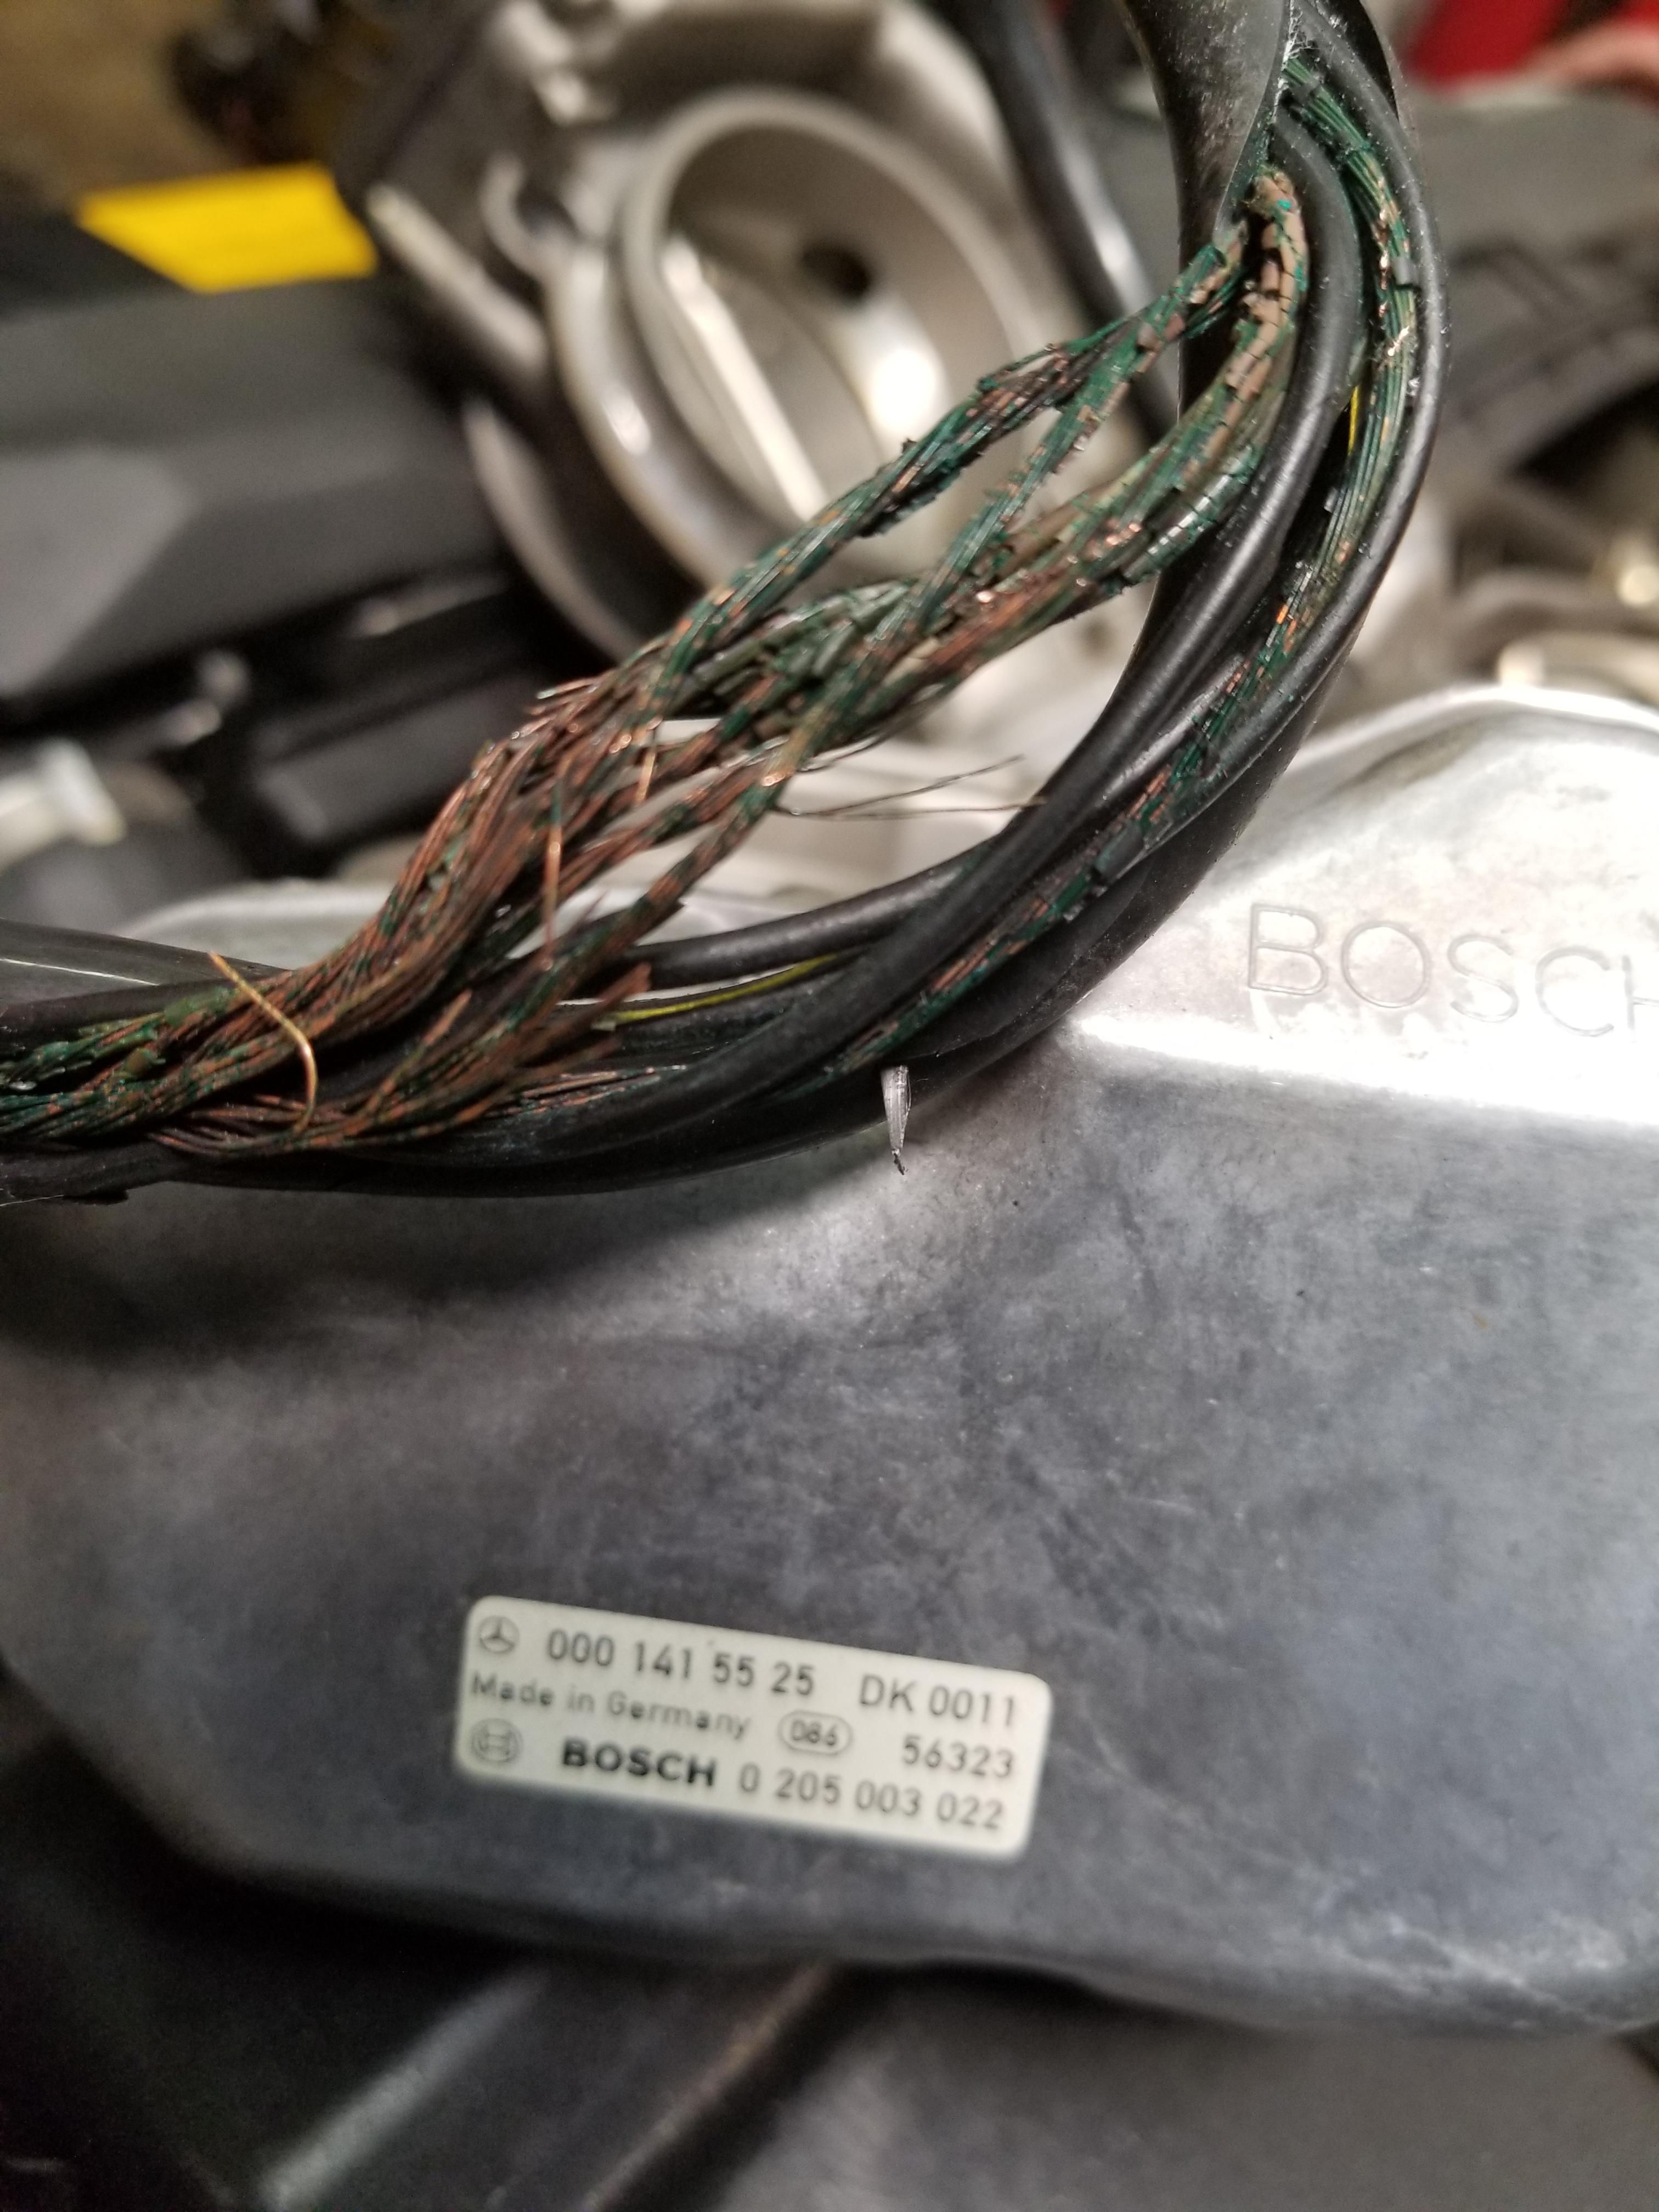 20170620_143642?w=527&h=702 uncategorized jason's space 2004 Porsche Cayenne Twin Turbo at mifinder.co